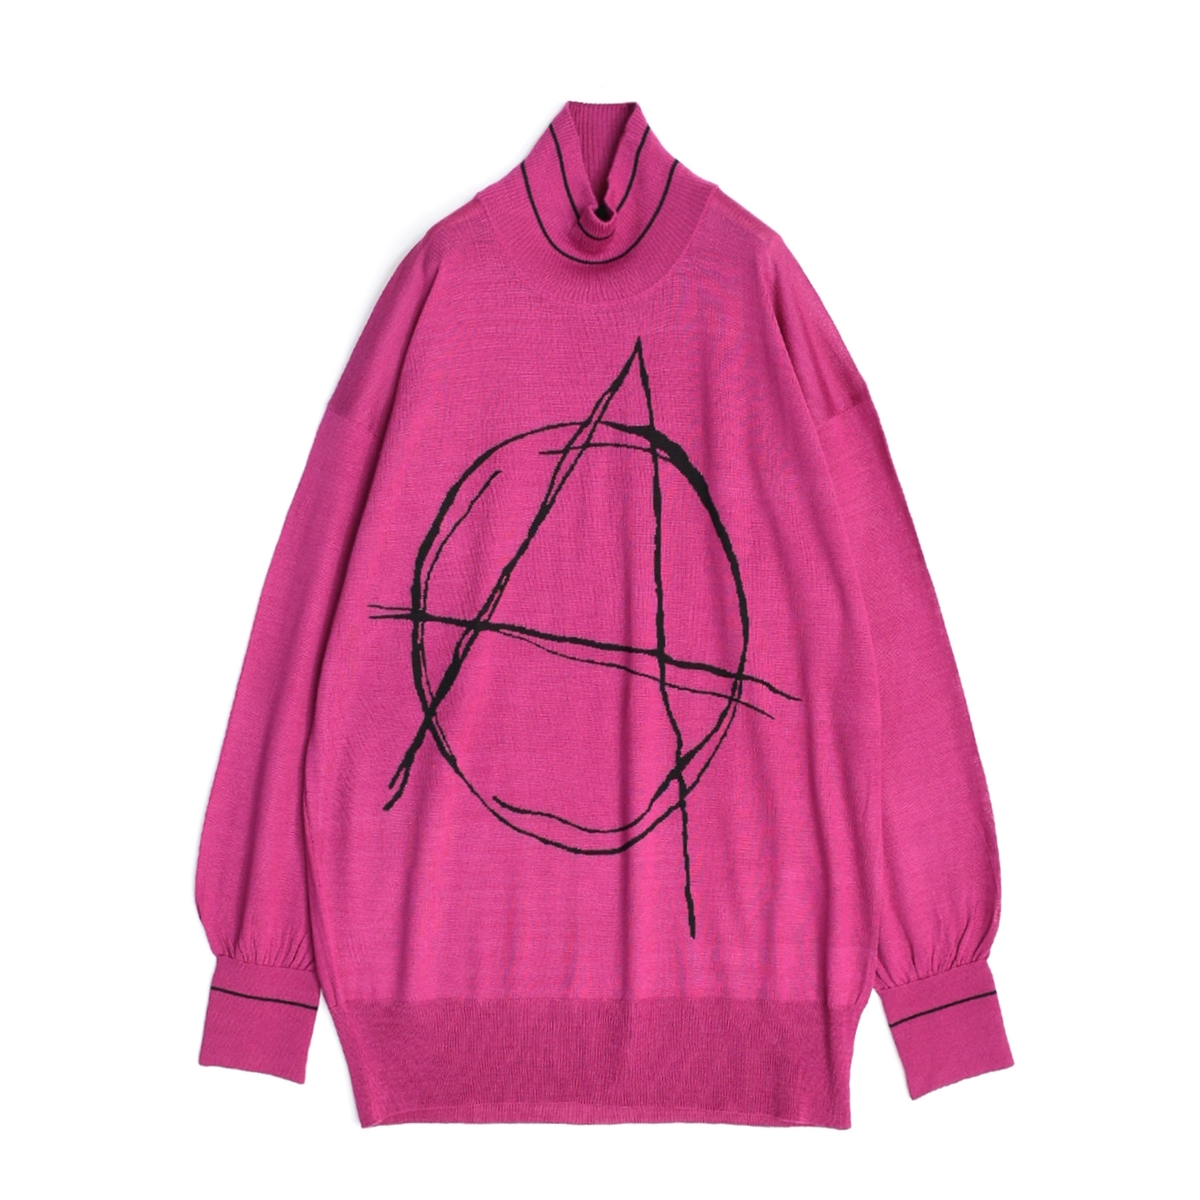 SALE 50%OFF SHAREEF 低価格化 INTERSIA JQ HIGH-NECK P O 2色 Pink Amethyst プルオーバー メンズ ジャガード 17714021 送料無料 最安値に挑戦 セーター ハイネック シャリーフ インターシャ ニット